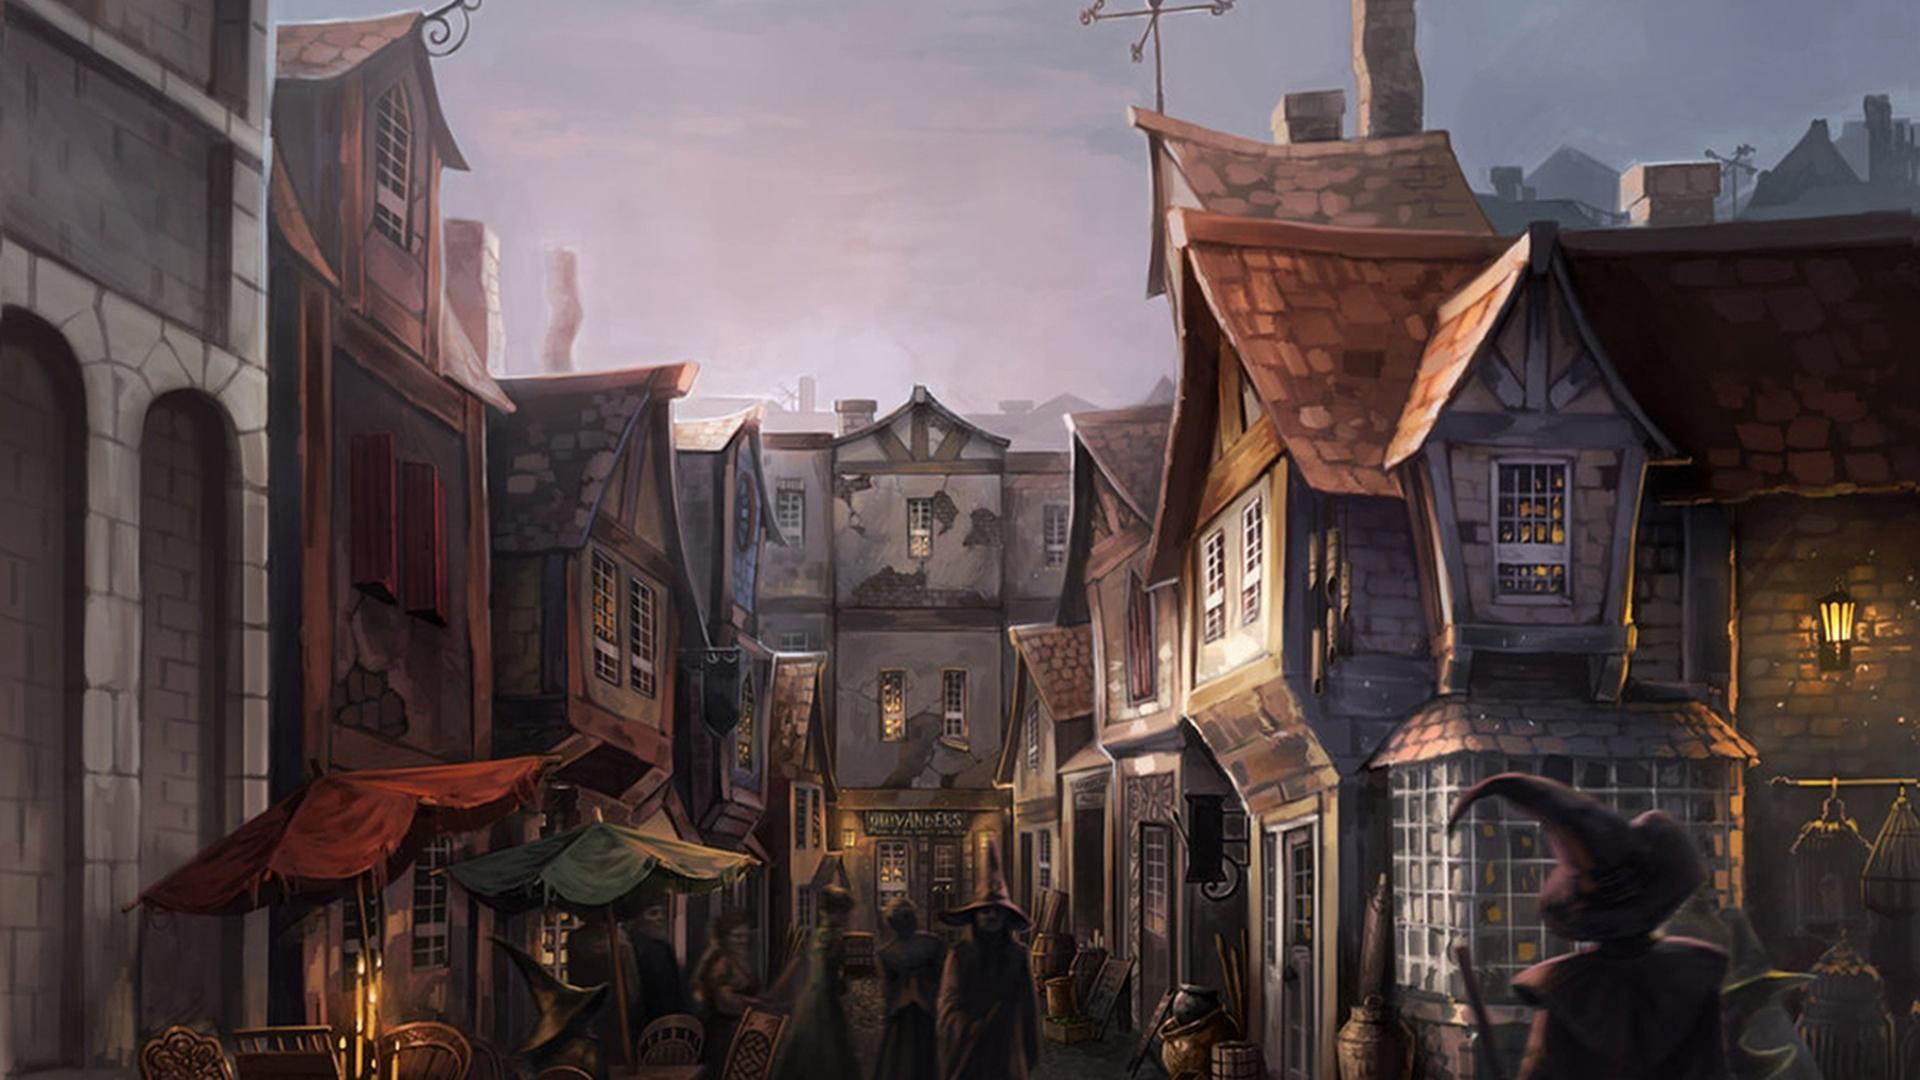 Harry Potter Art Wallpapers Top Free Harry Potter Art Backgrounds Wallpaperaccess